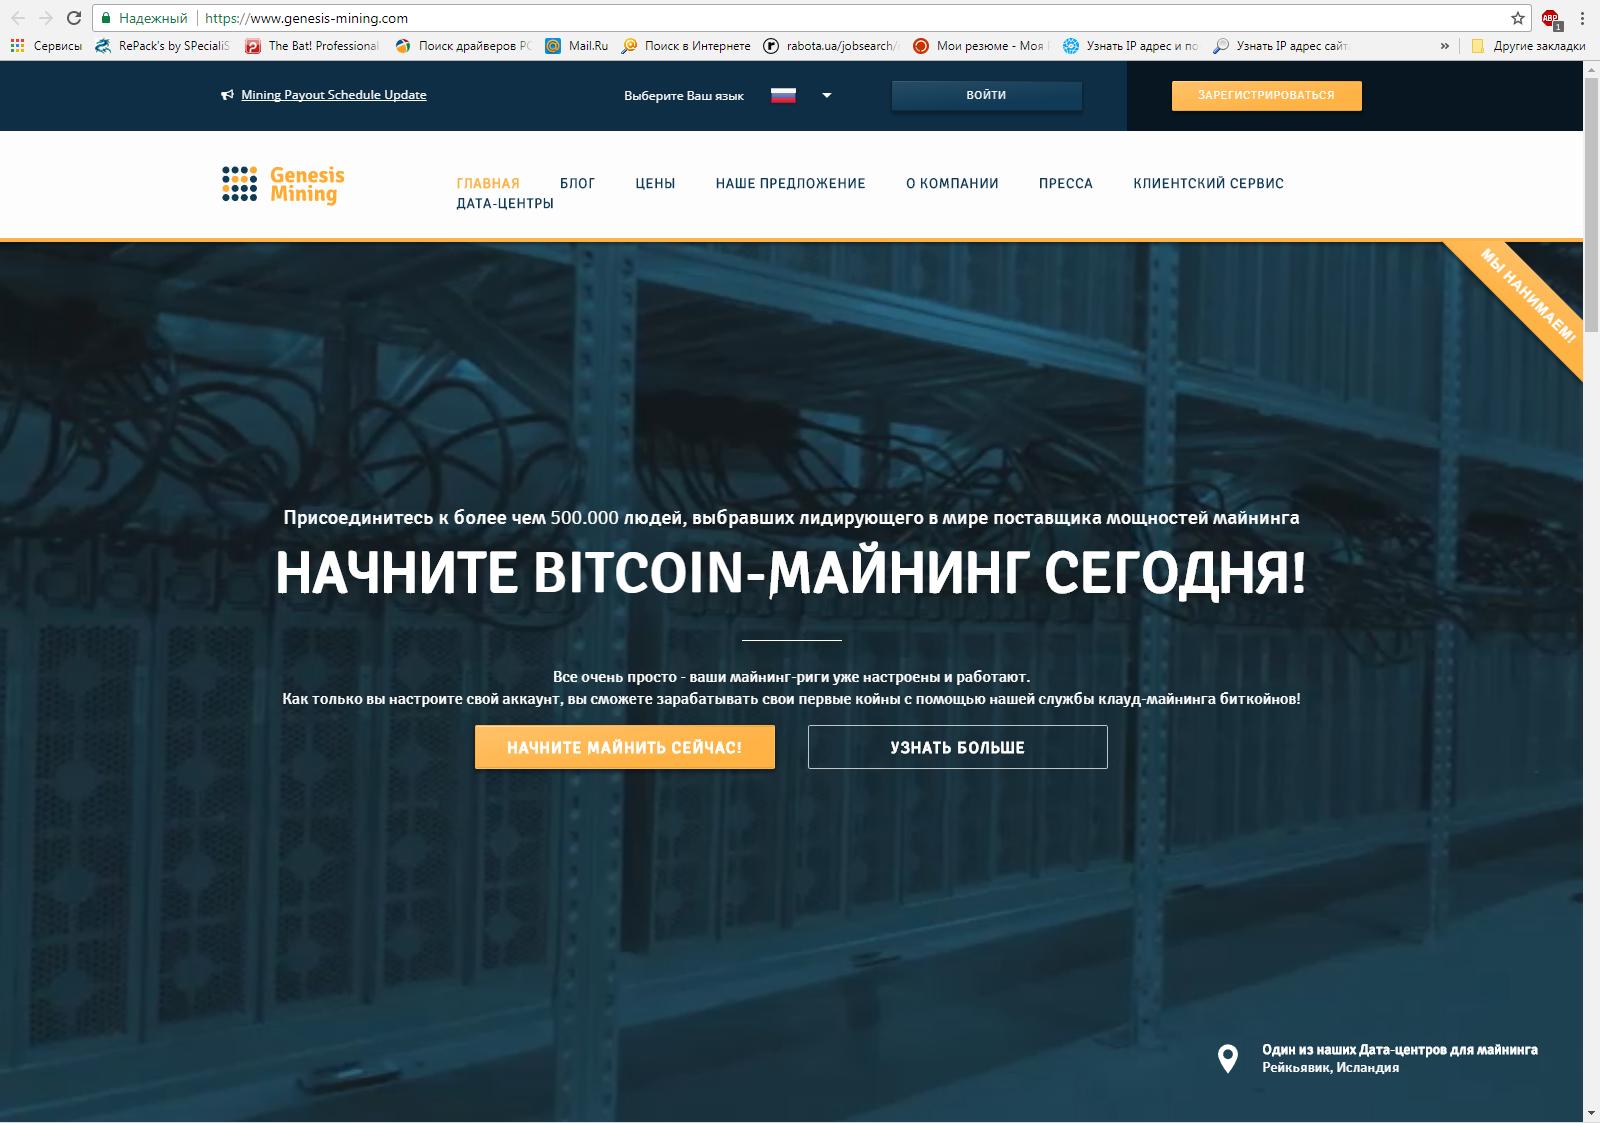 Майнинг биткоинов форум отзывы-1